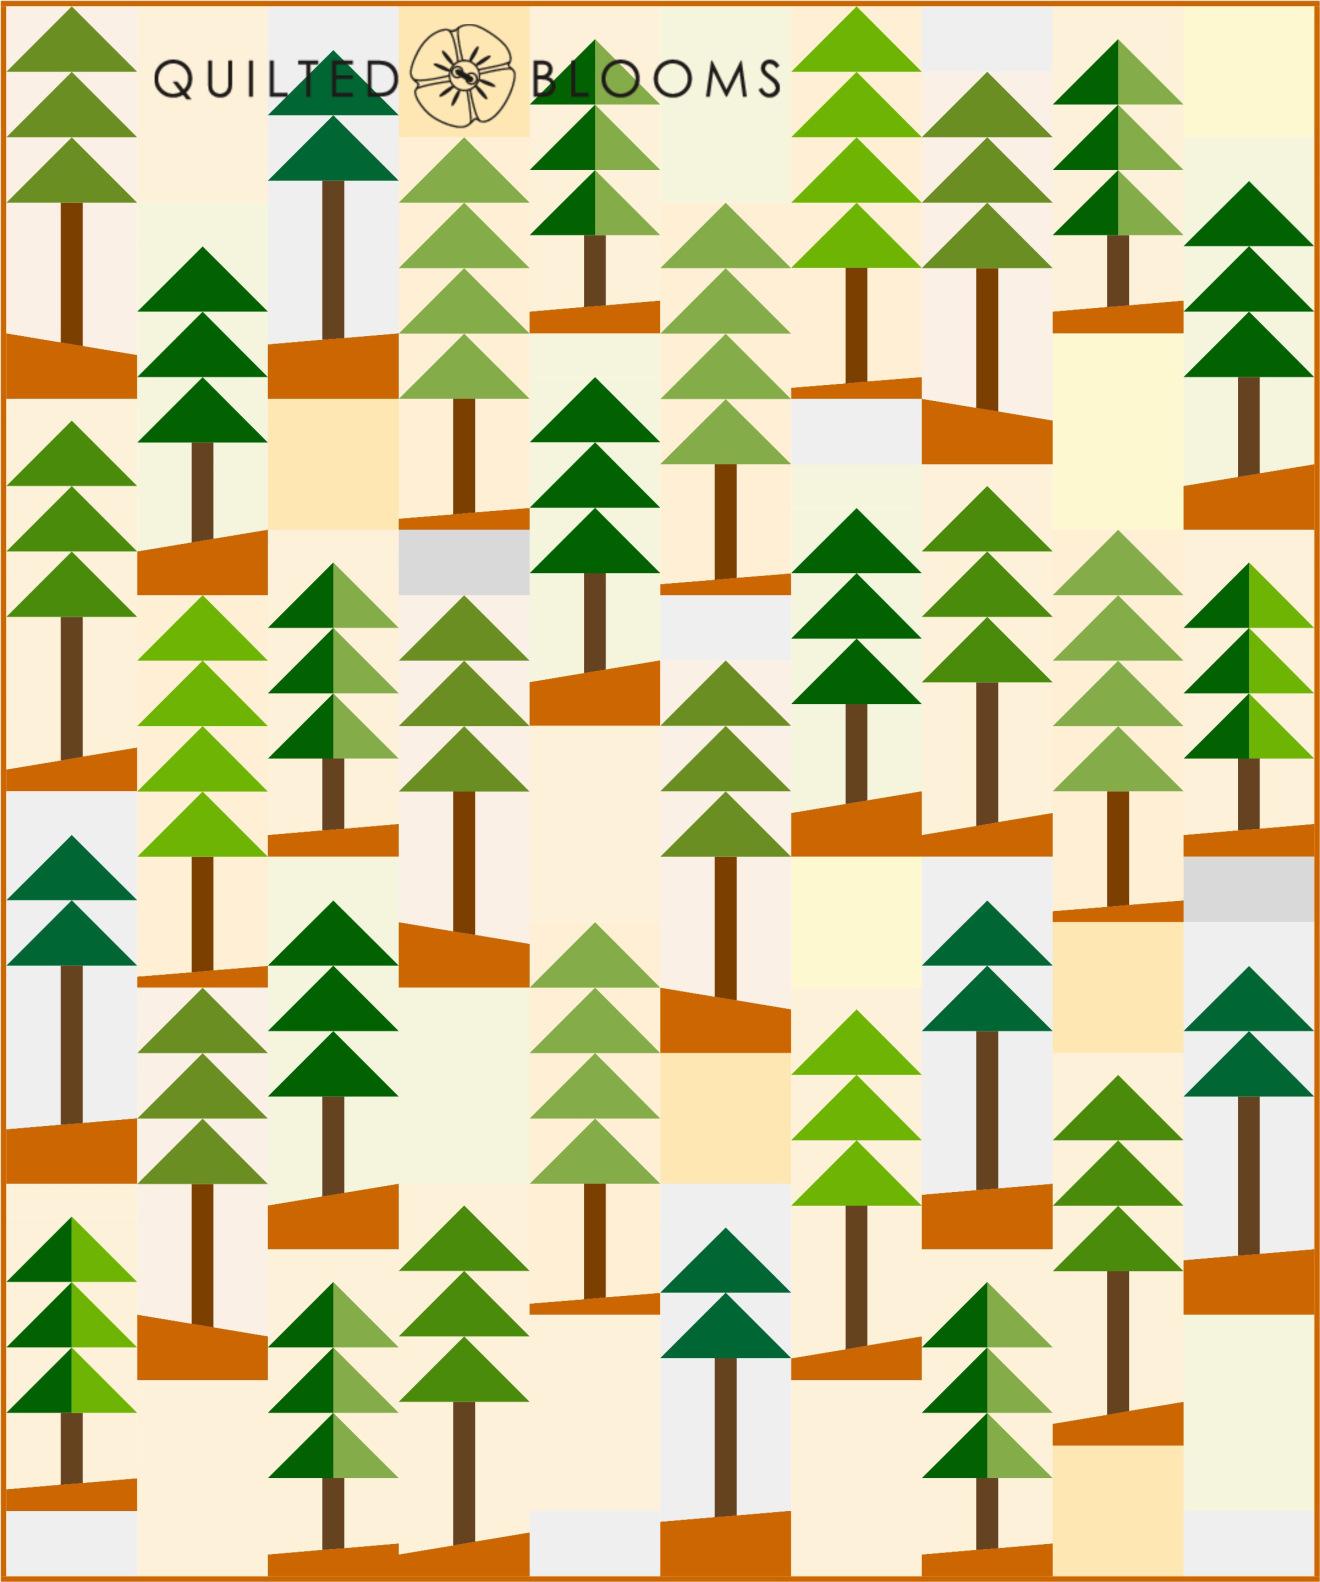 planted-pines-no-seams-sm-wm.jpg